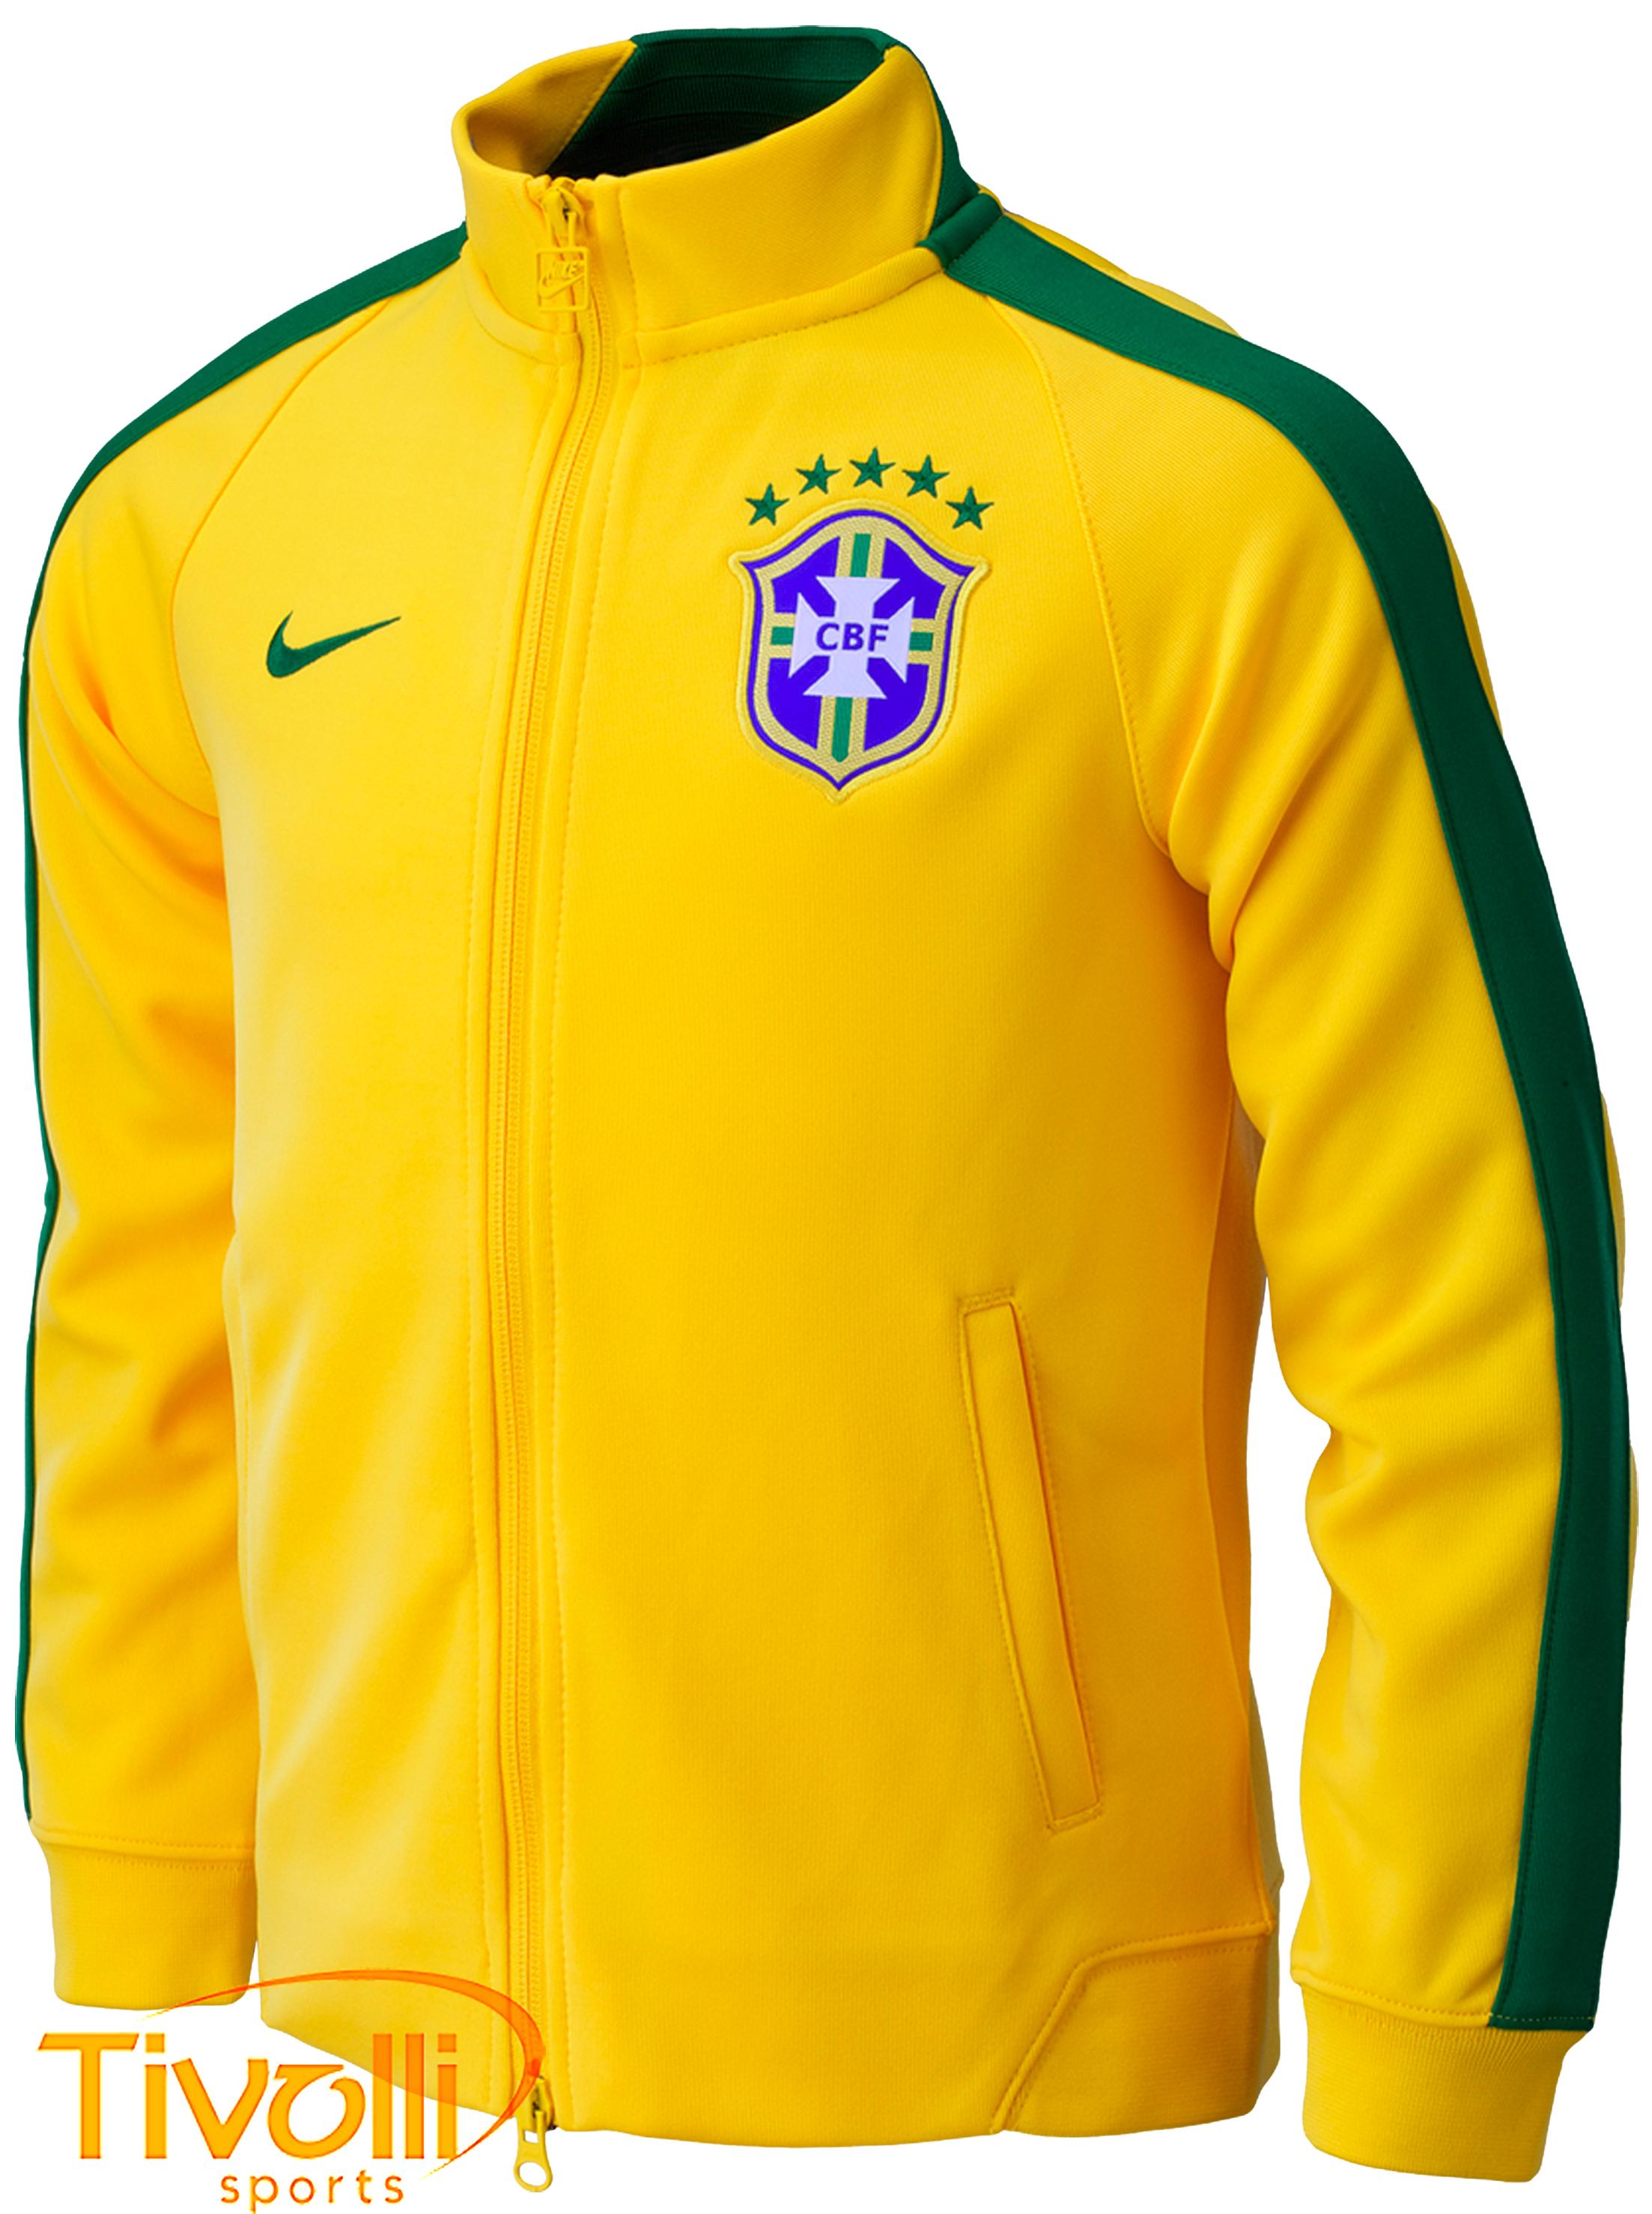 Jaqueta Brasil Nike CBF infantil   2014 Amarela e verde   b2f1488d6f292